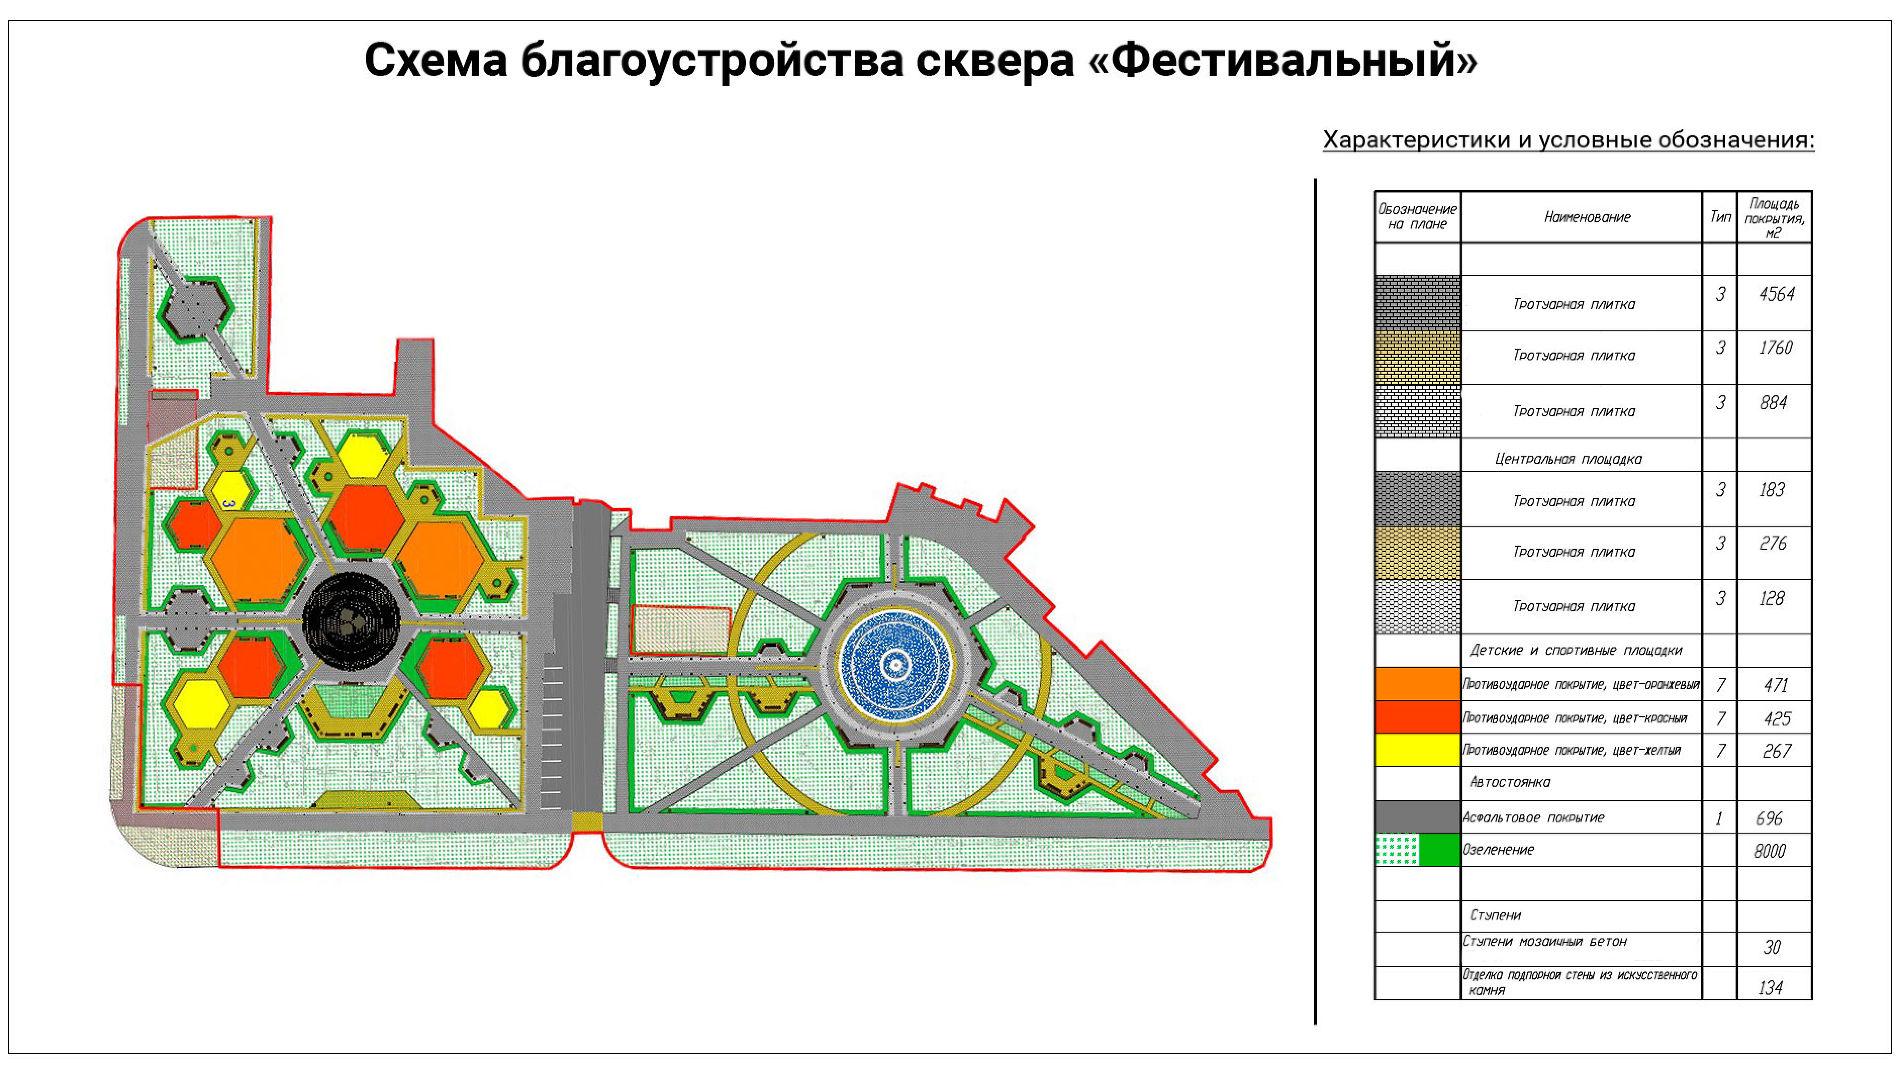 ©Картинка пресс-службы администрации Краснодара